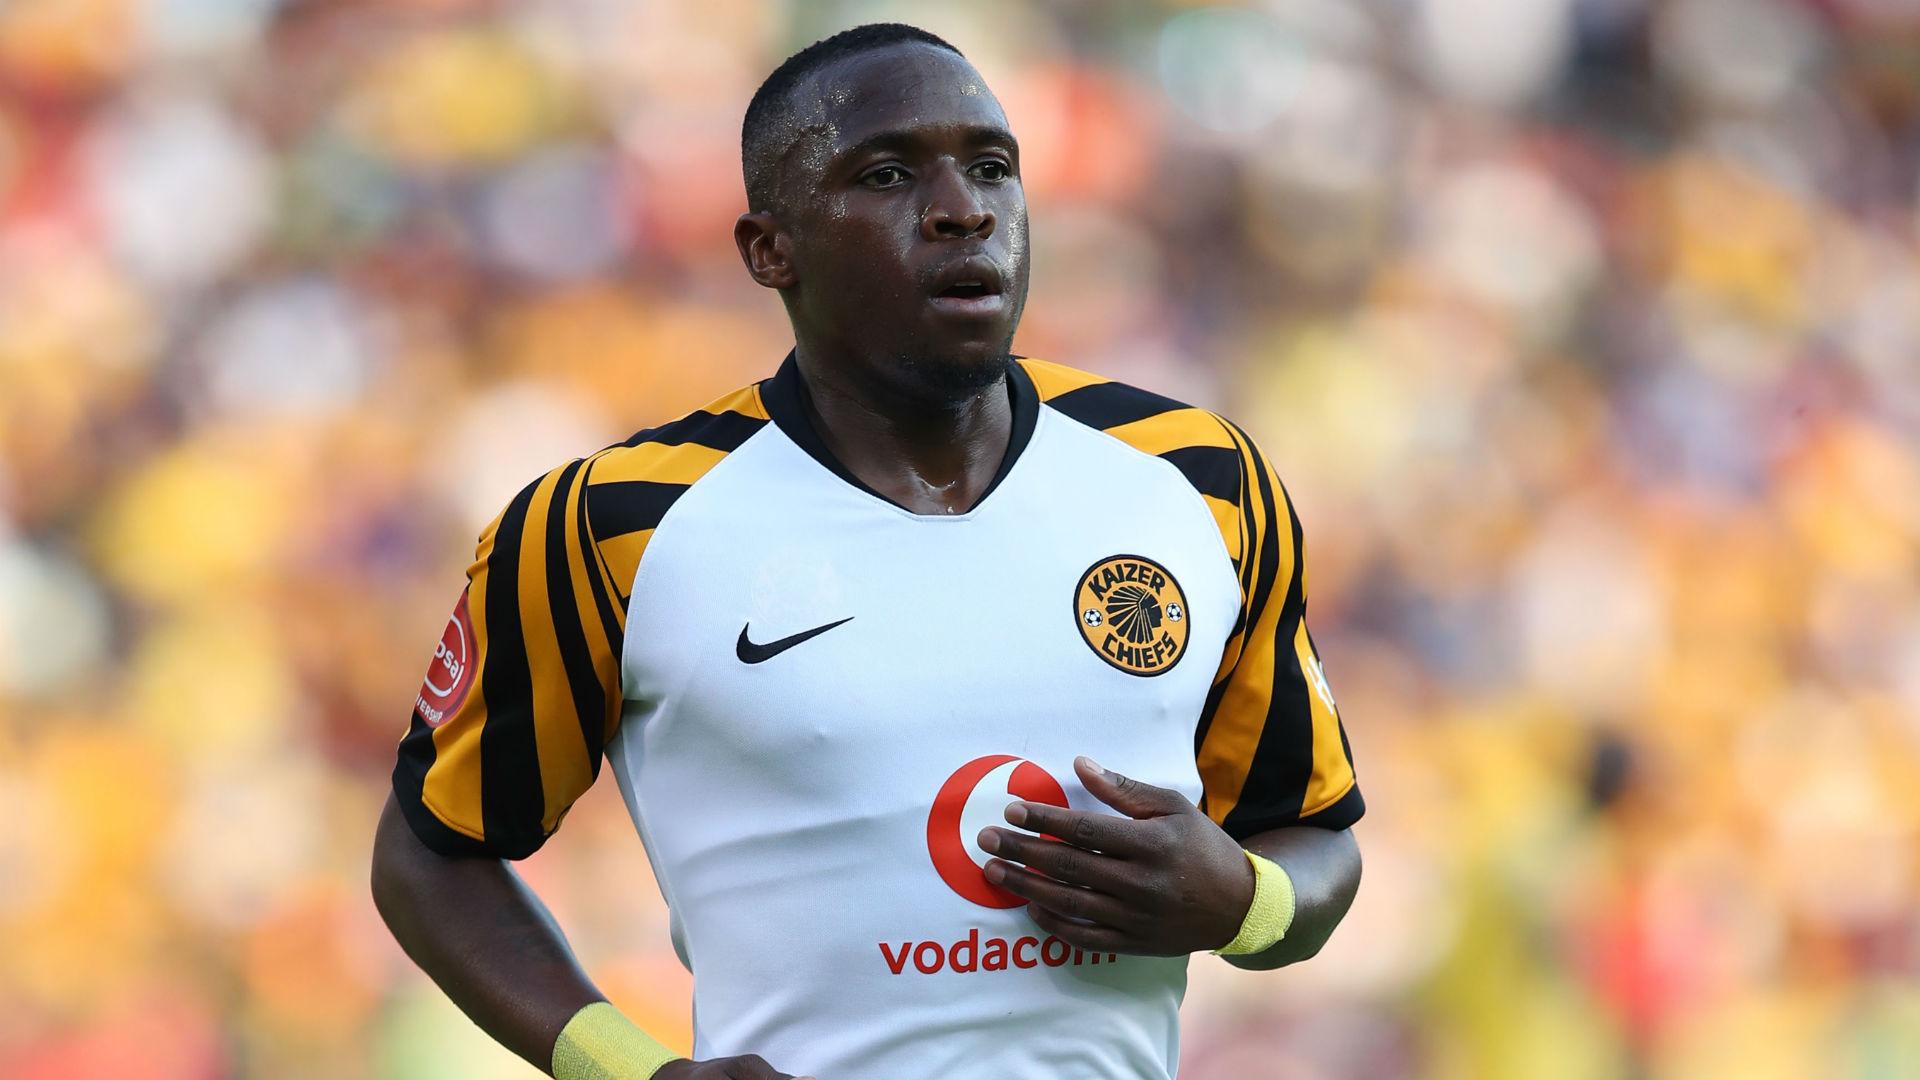 Mphela compares Maluleka's move to Mamelodi Sundowns like Ronaldo to Juventus